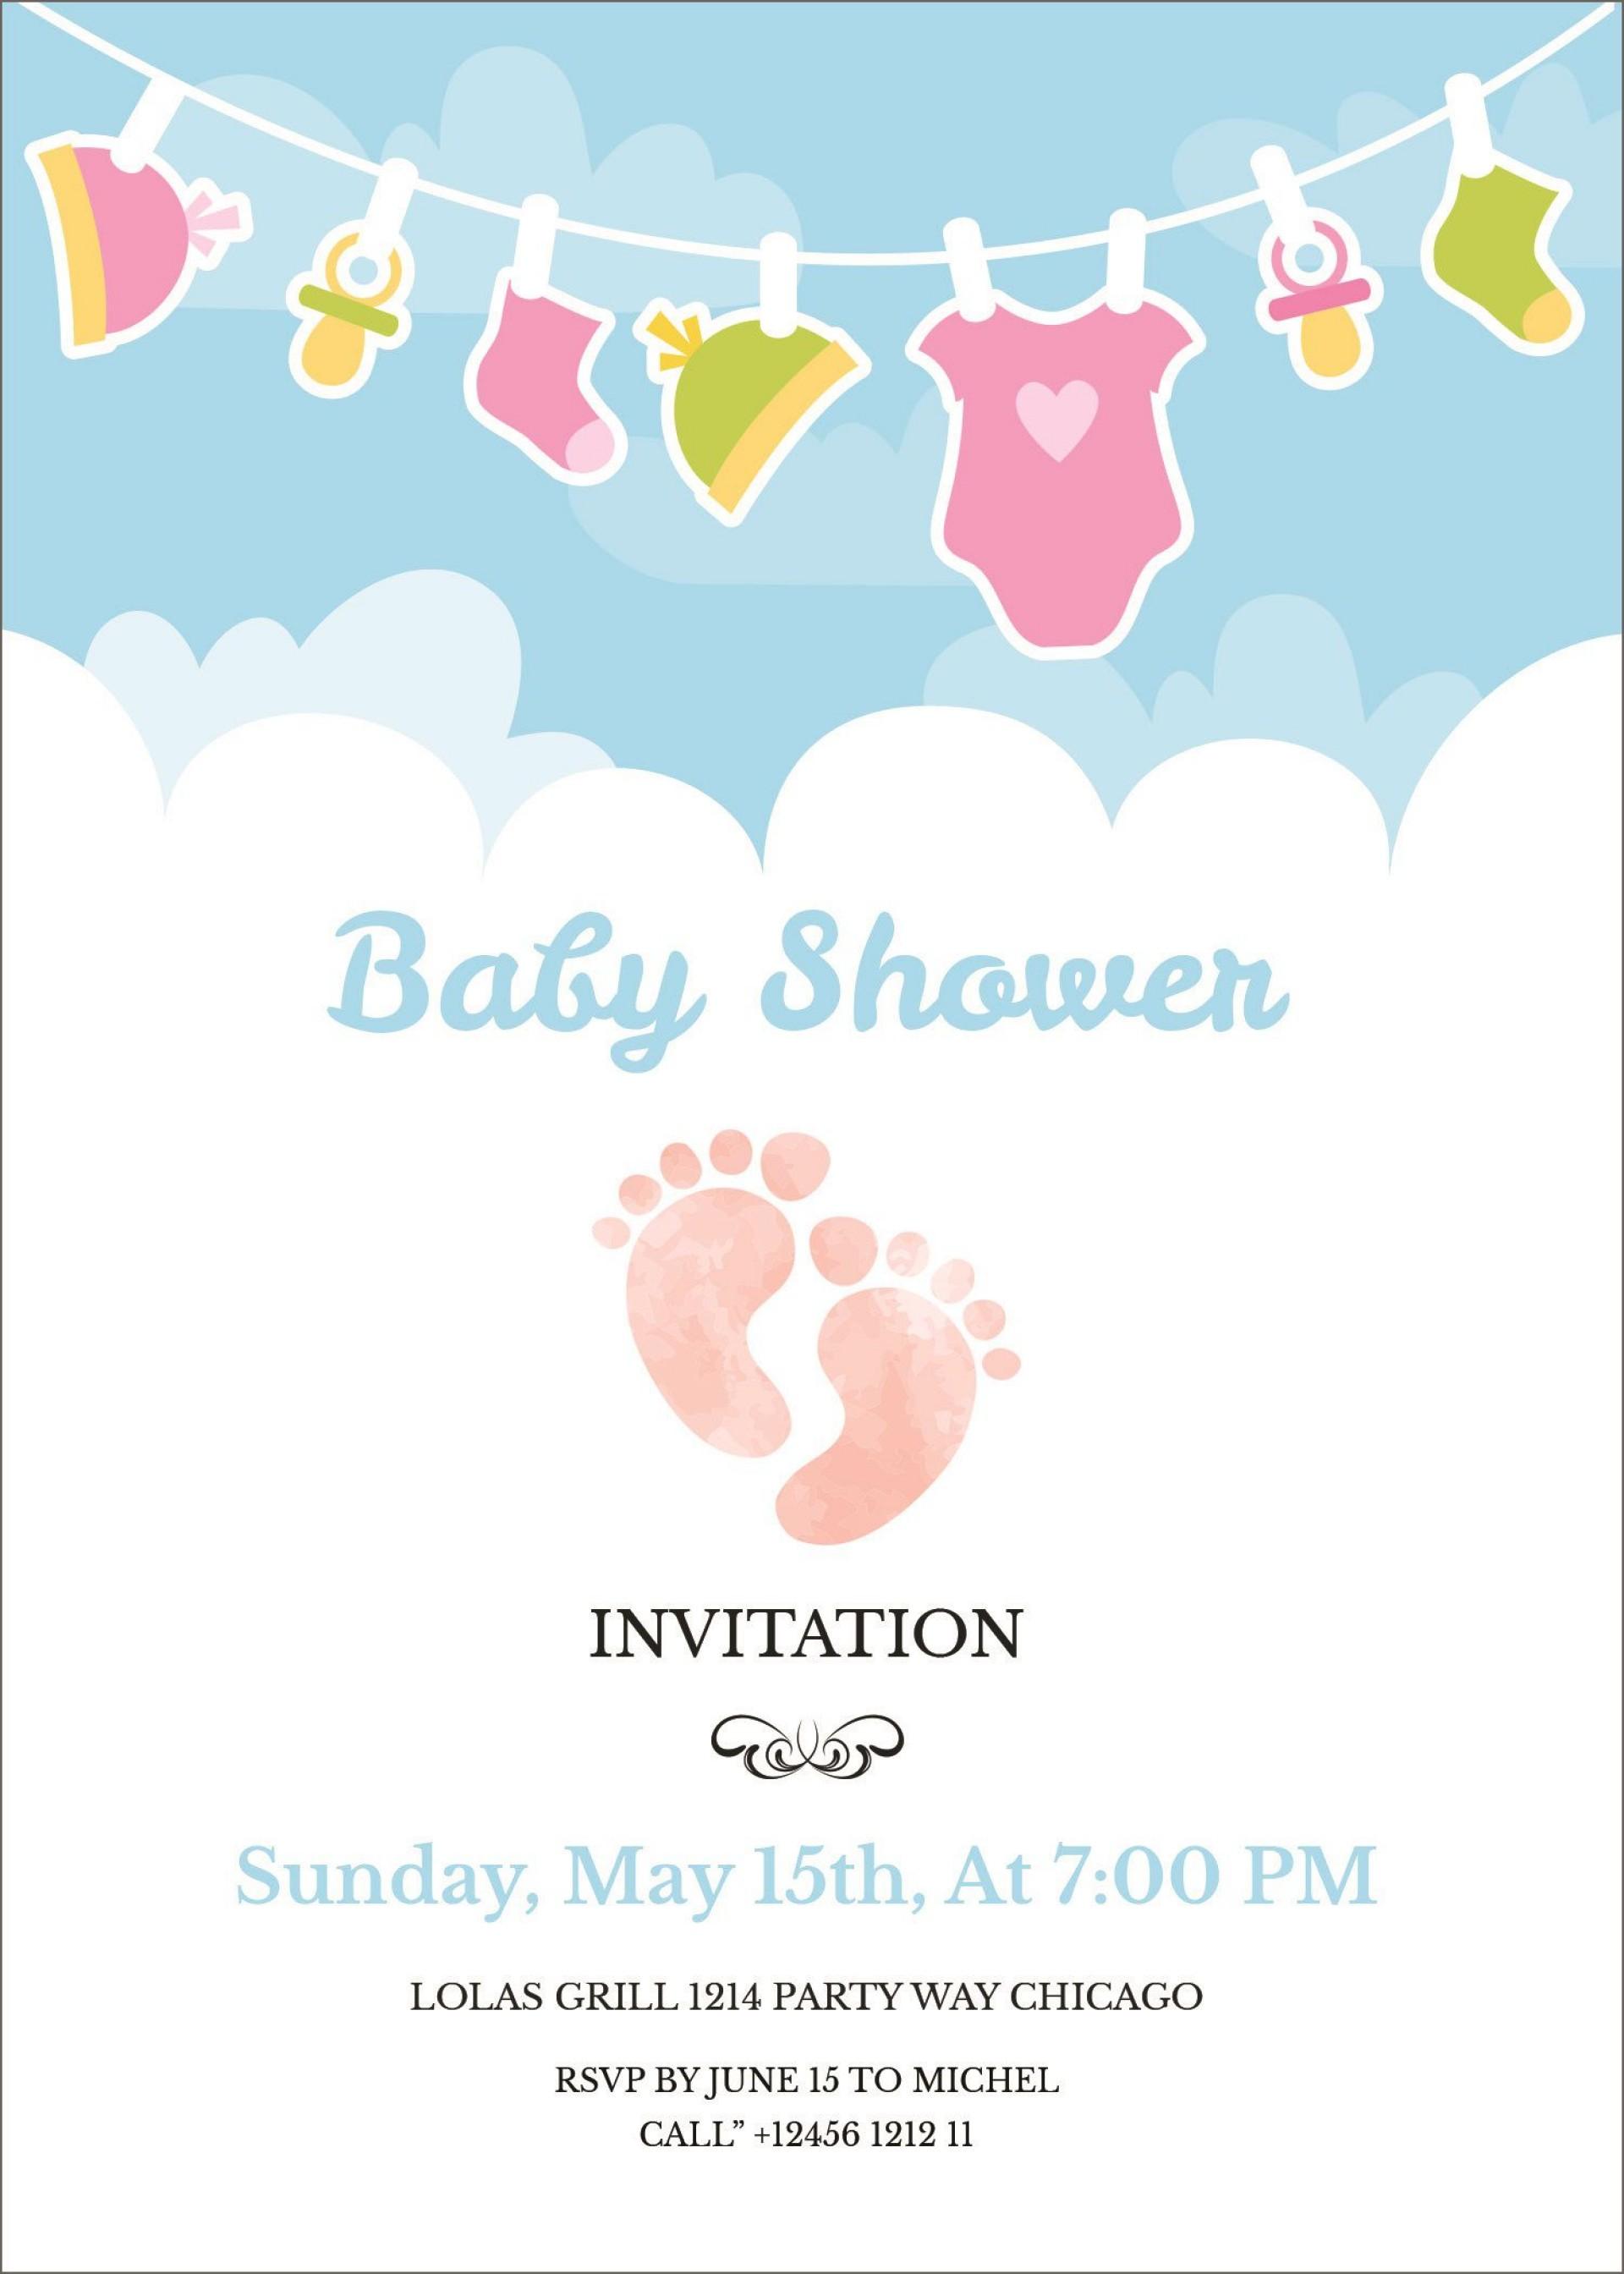 005 Rare Free Baby Shower Invitation Template Editable Highest Quality  Digital Microsoft Word1920